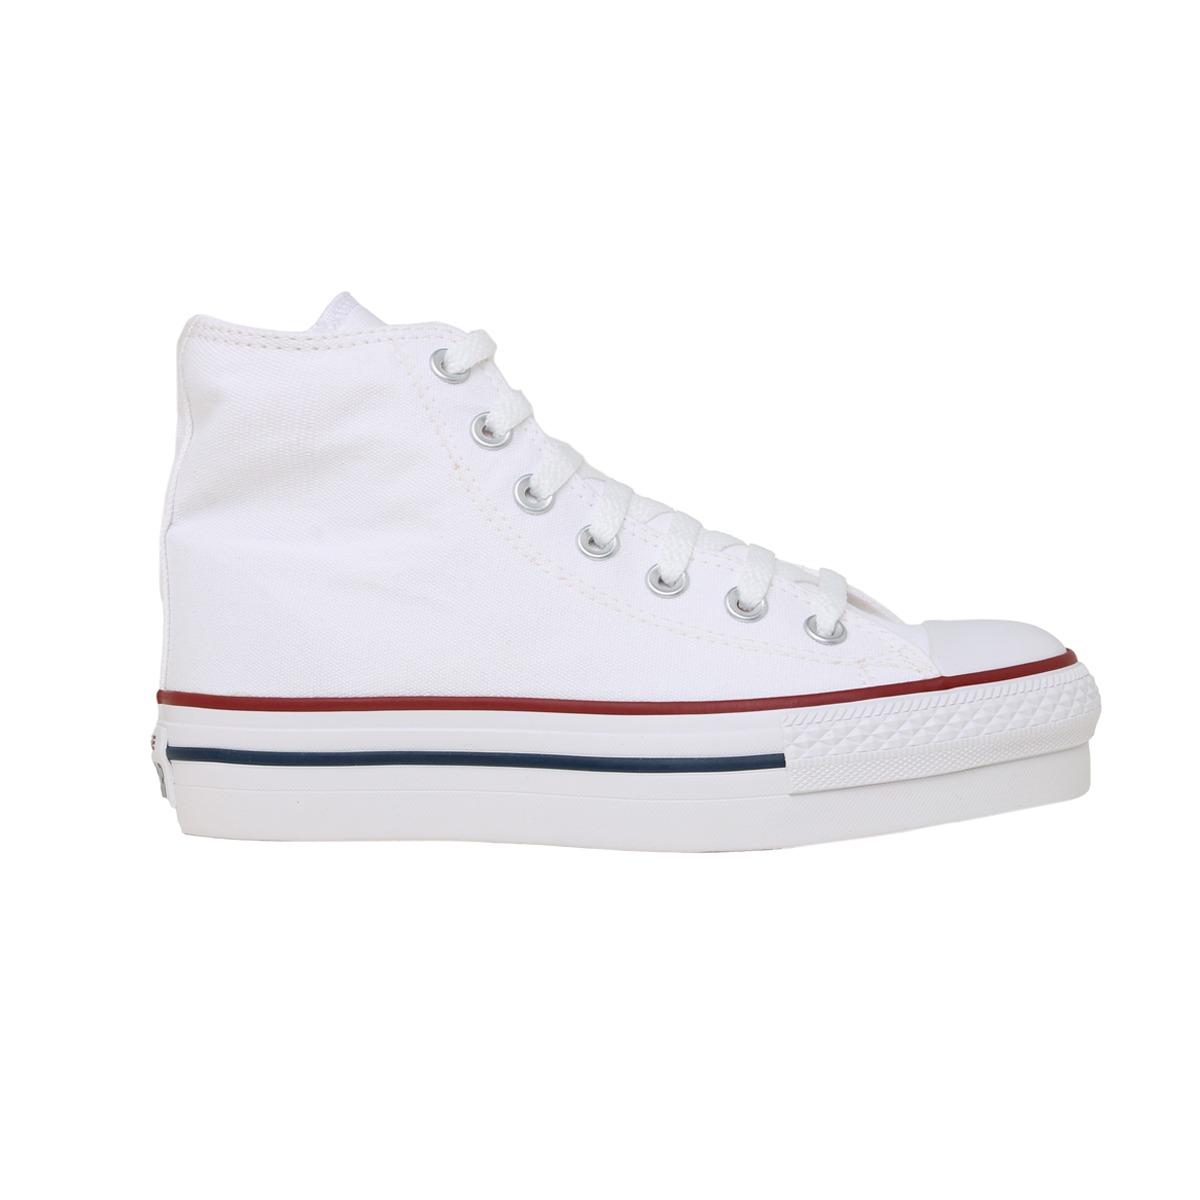 b01b17016dd botas converse moda chuck taylor all star platform mujer bl. Cargando zoom.